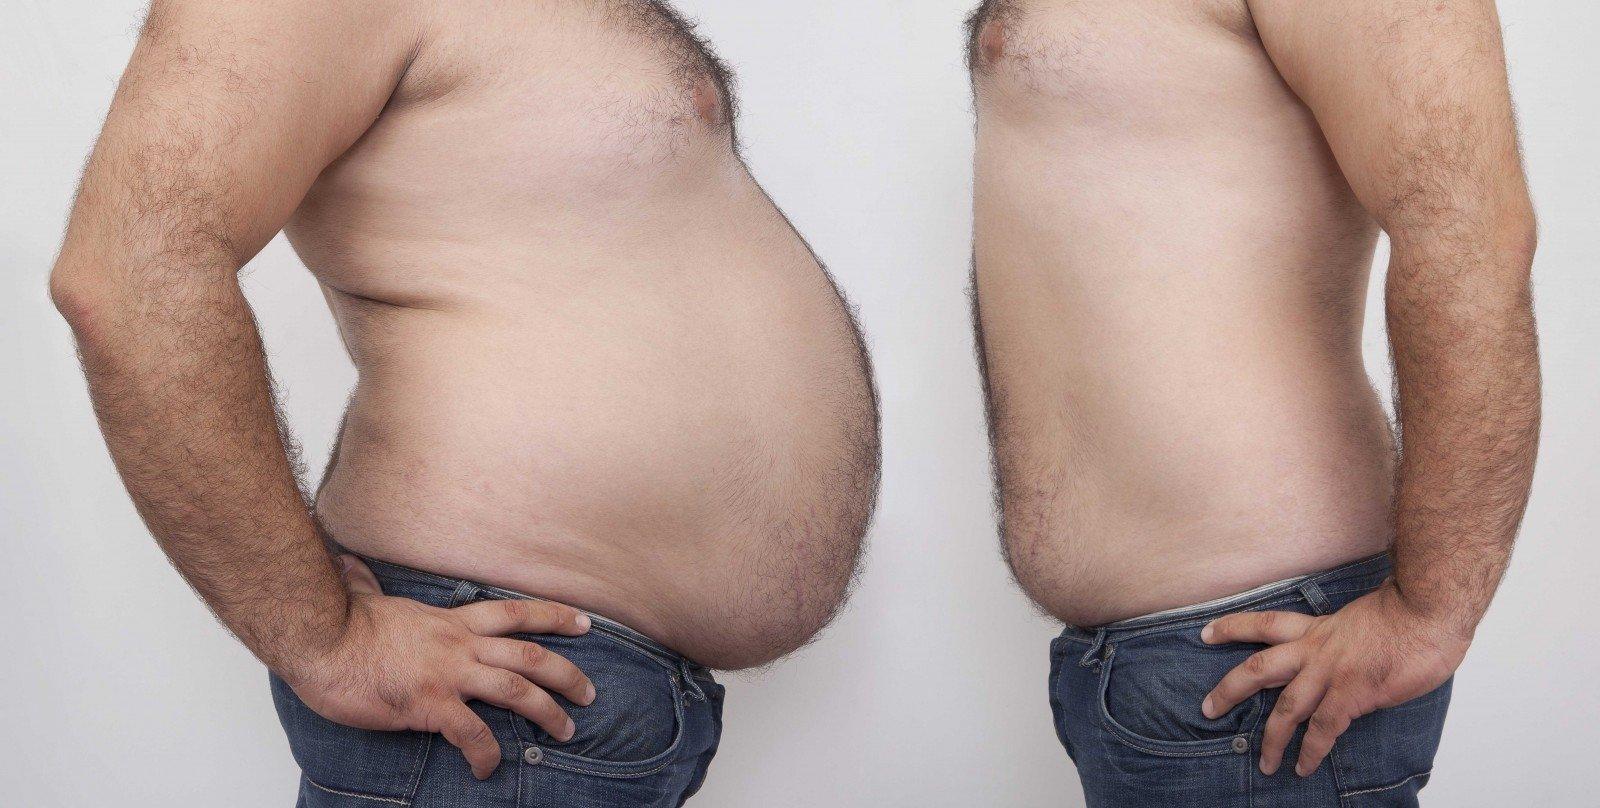 būtina mesti svorį)